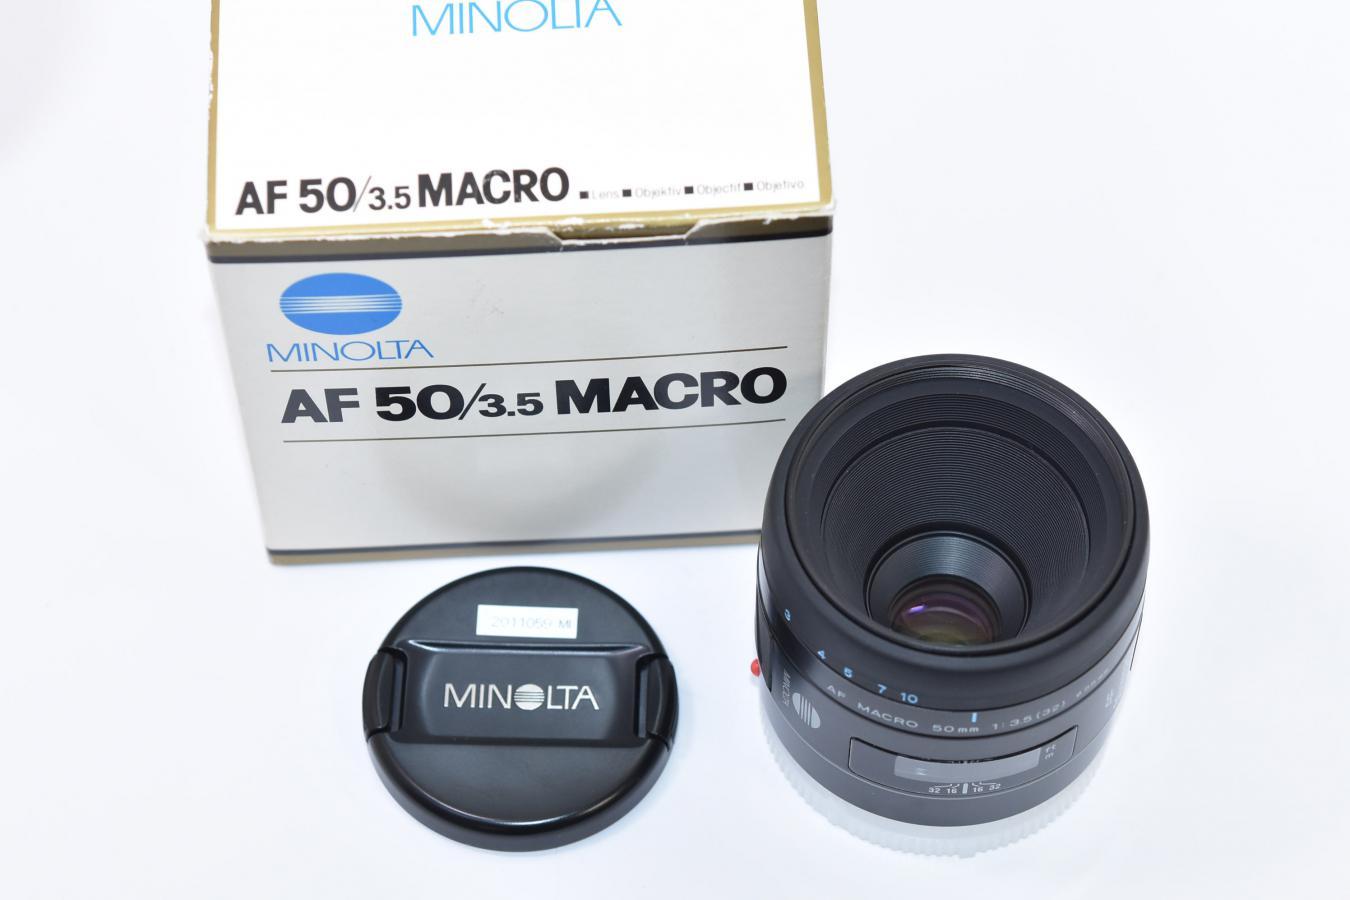 MINOLTA AF 50mm F3.5 MACRO NEW 【元箱付】